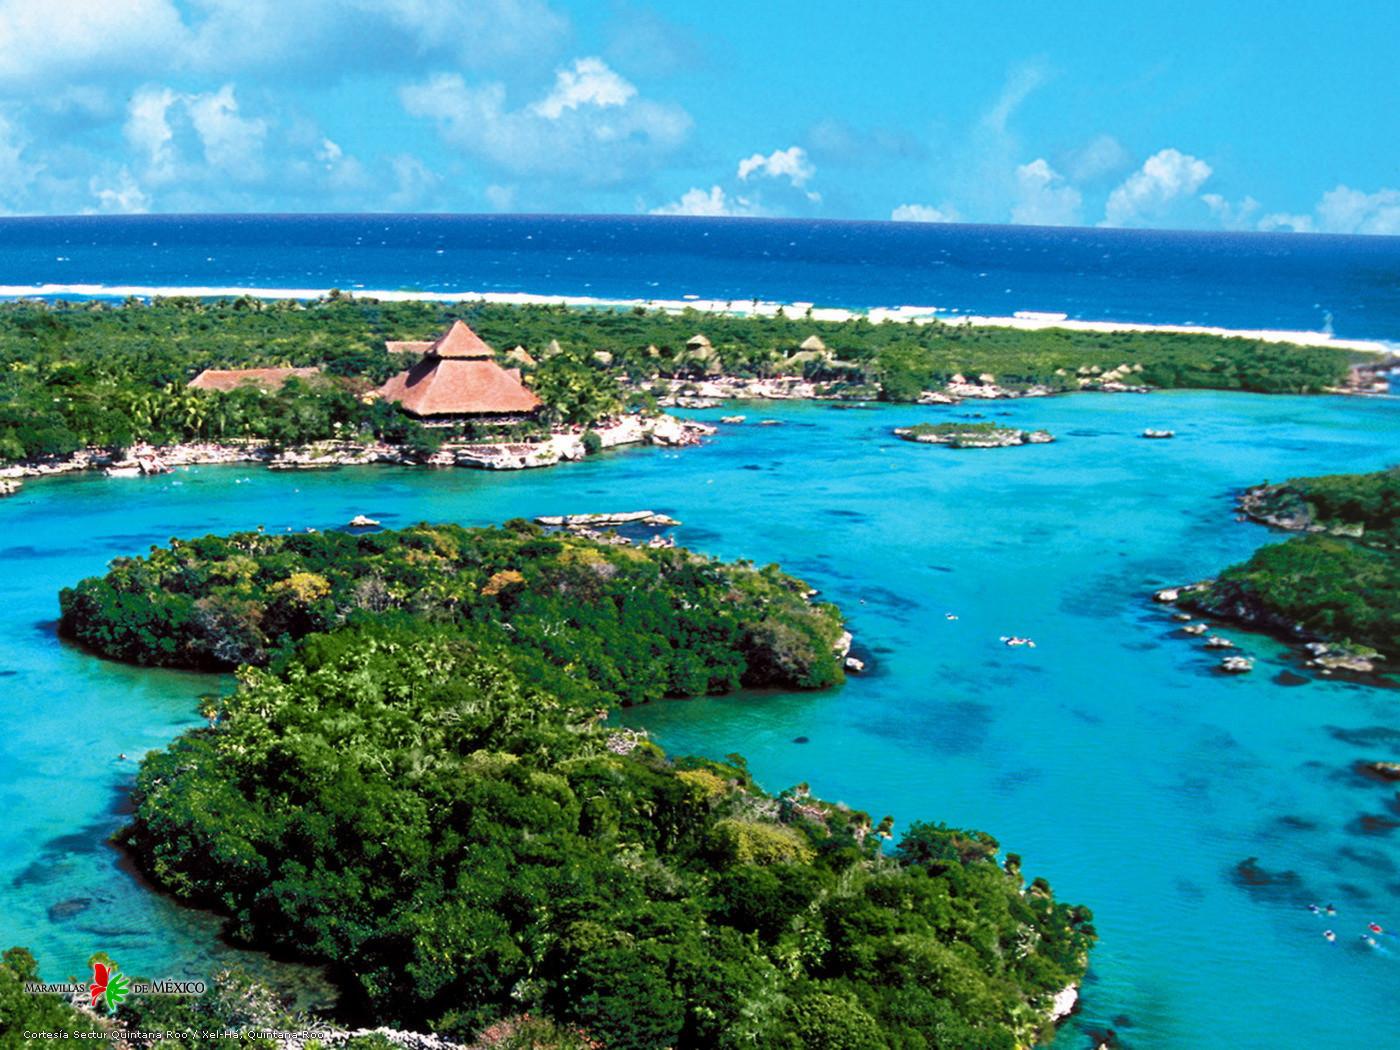 Sun, Sand And The Caribbean Sea On The Riviera Maya